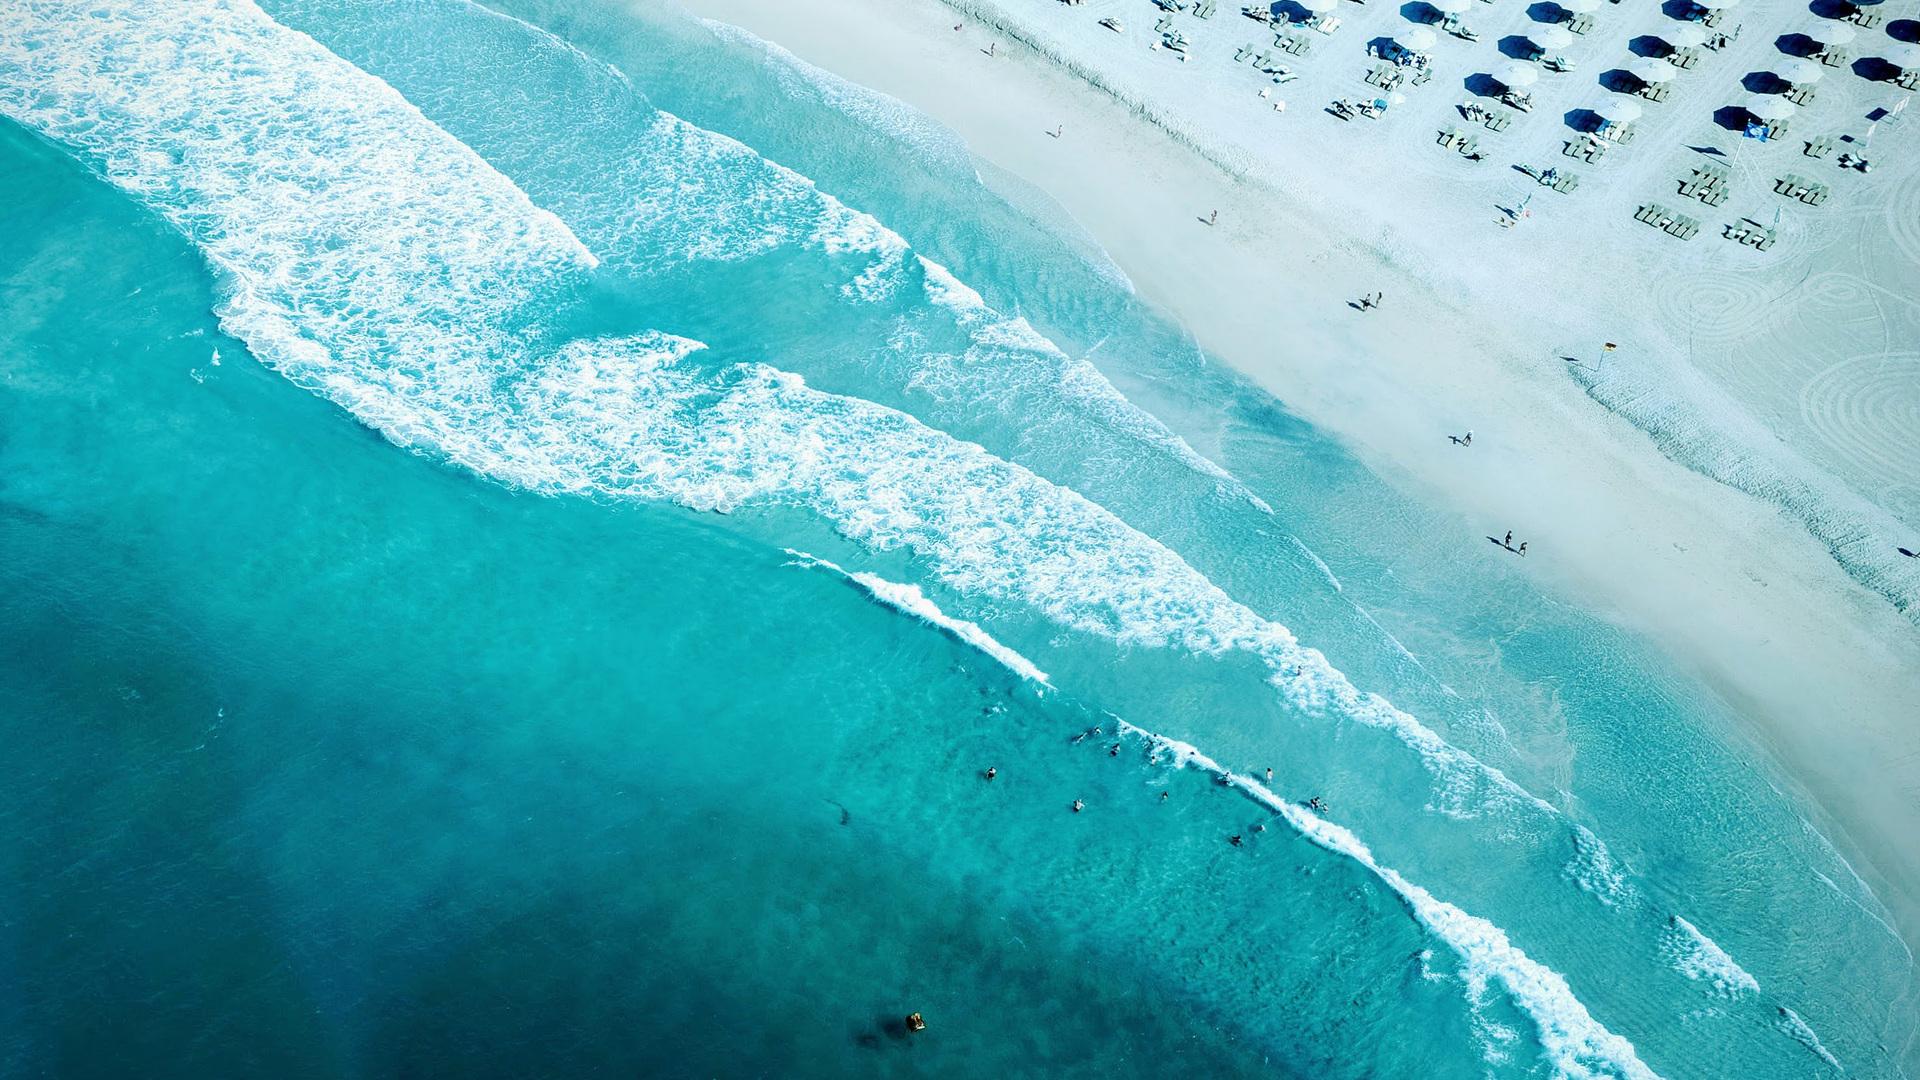 Beach Seashore Aerial Photography 2e